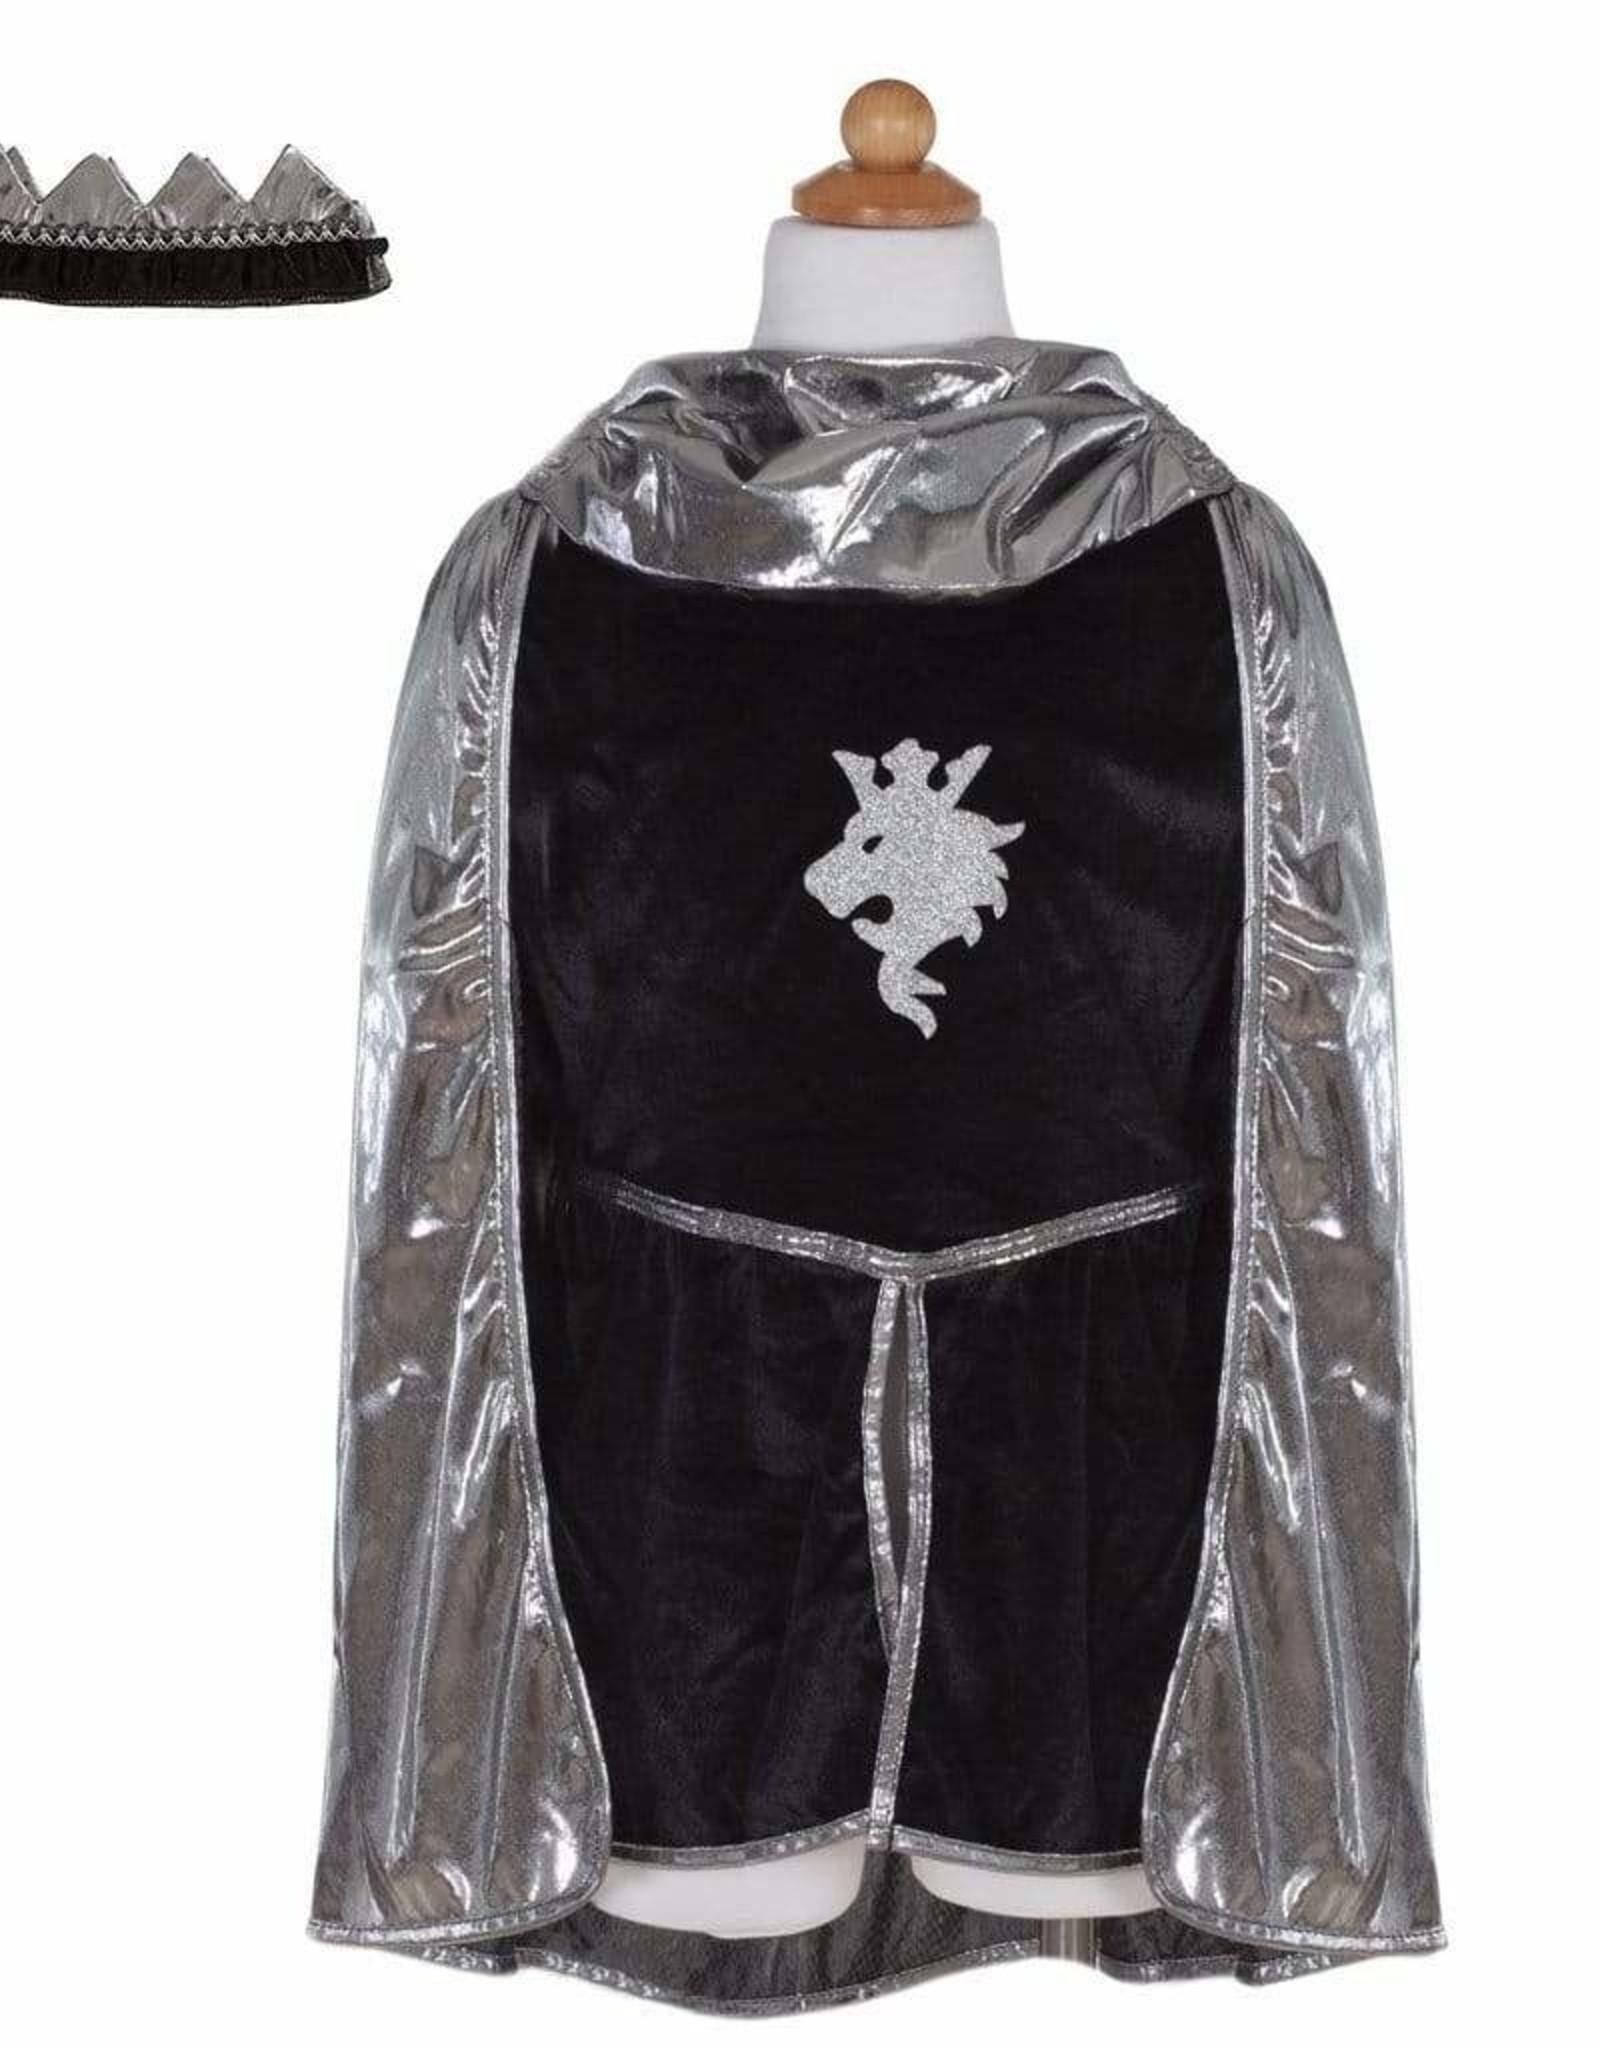 Great Pretenders Silver Knight Tunic Cape & Crown - Size 5-6